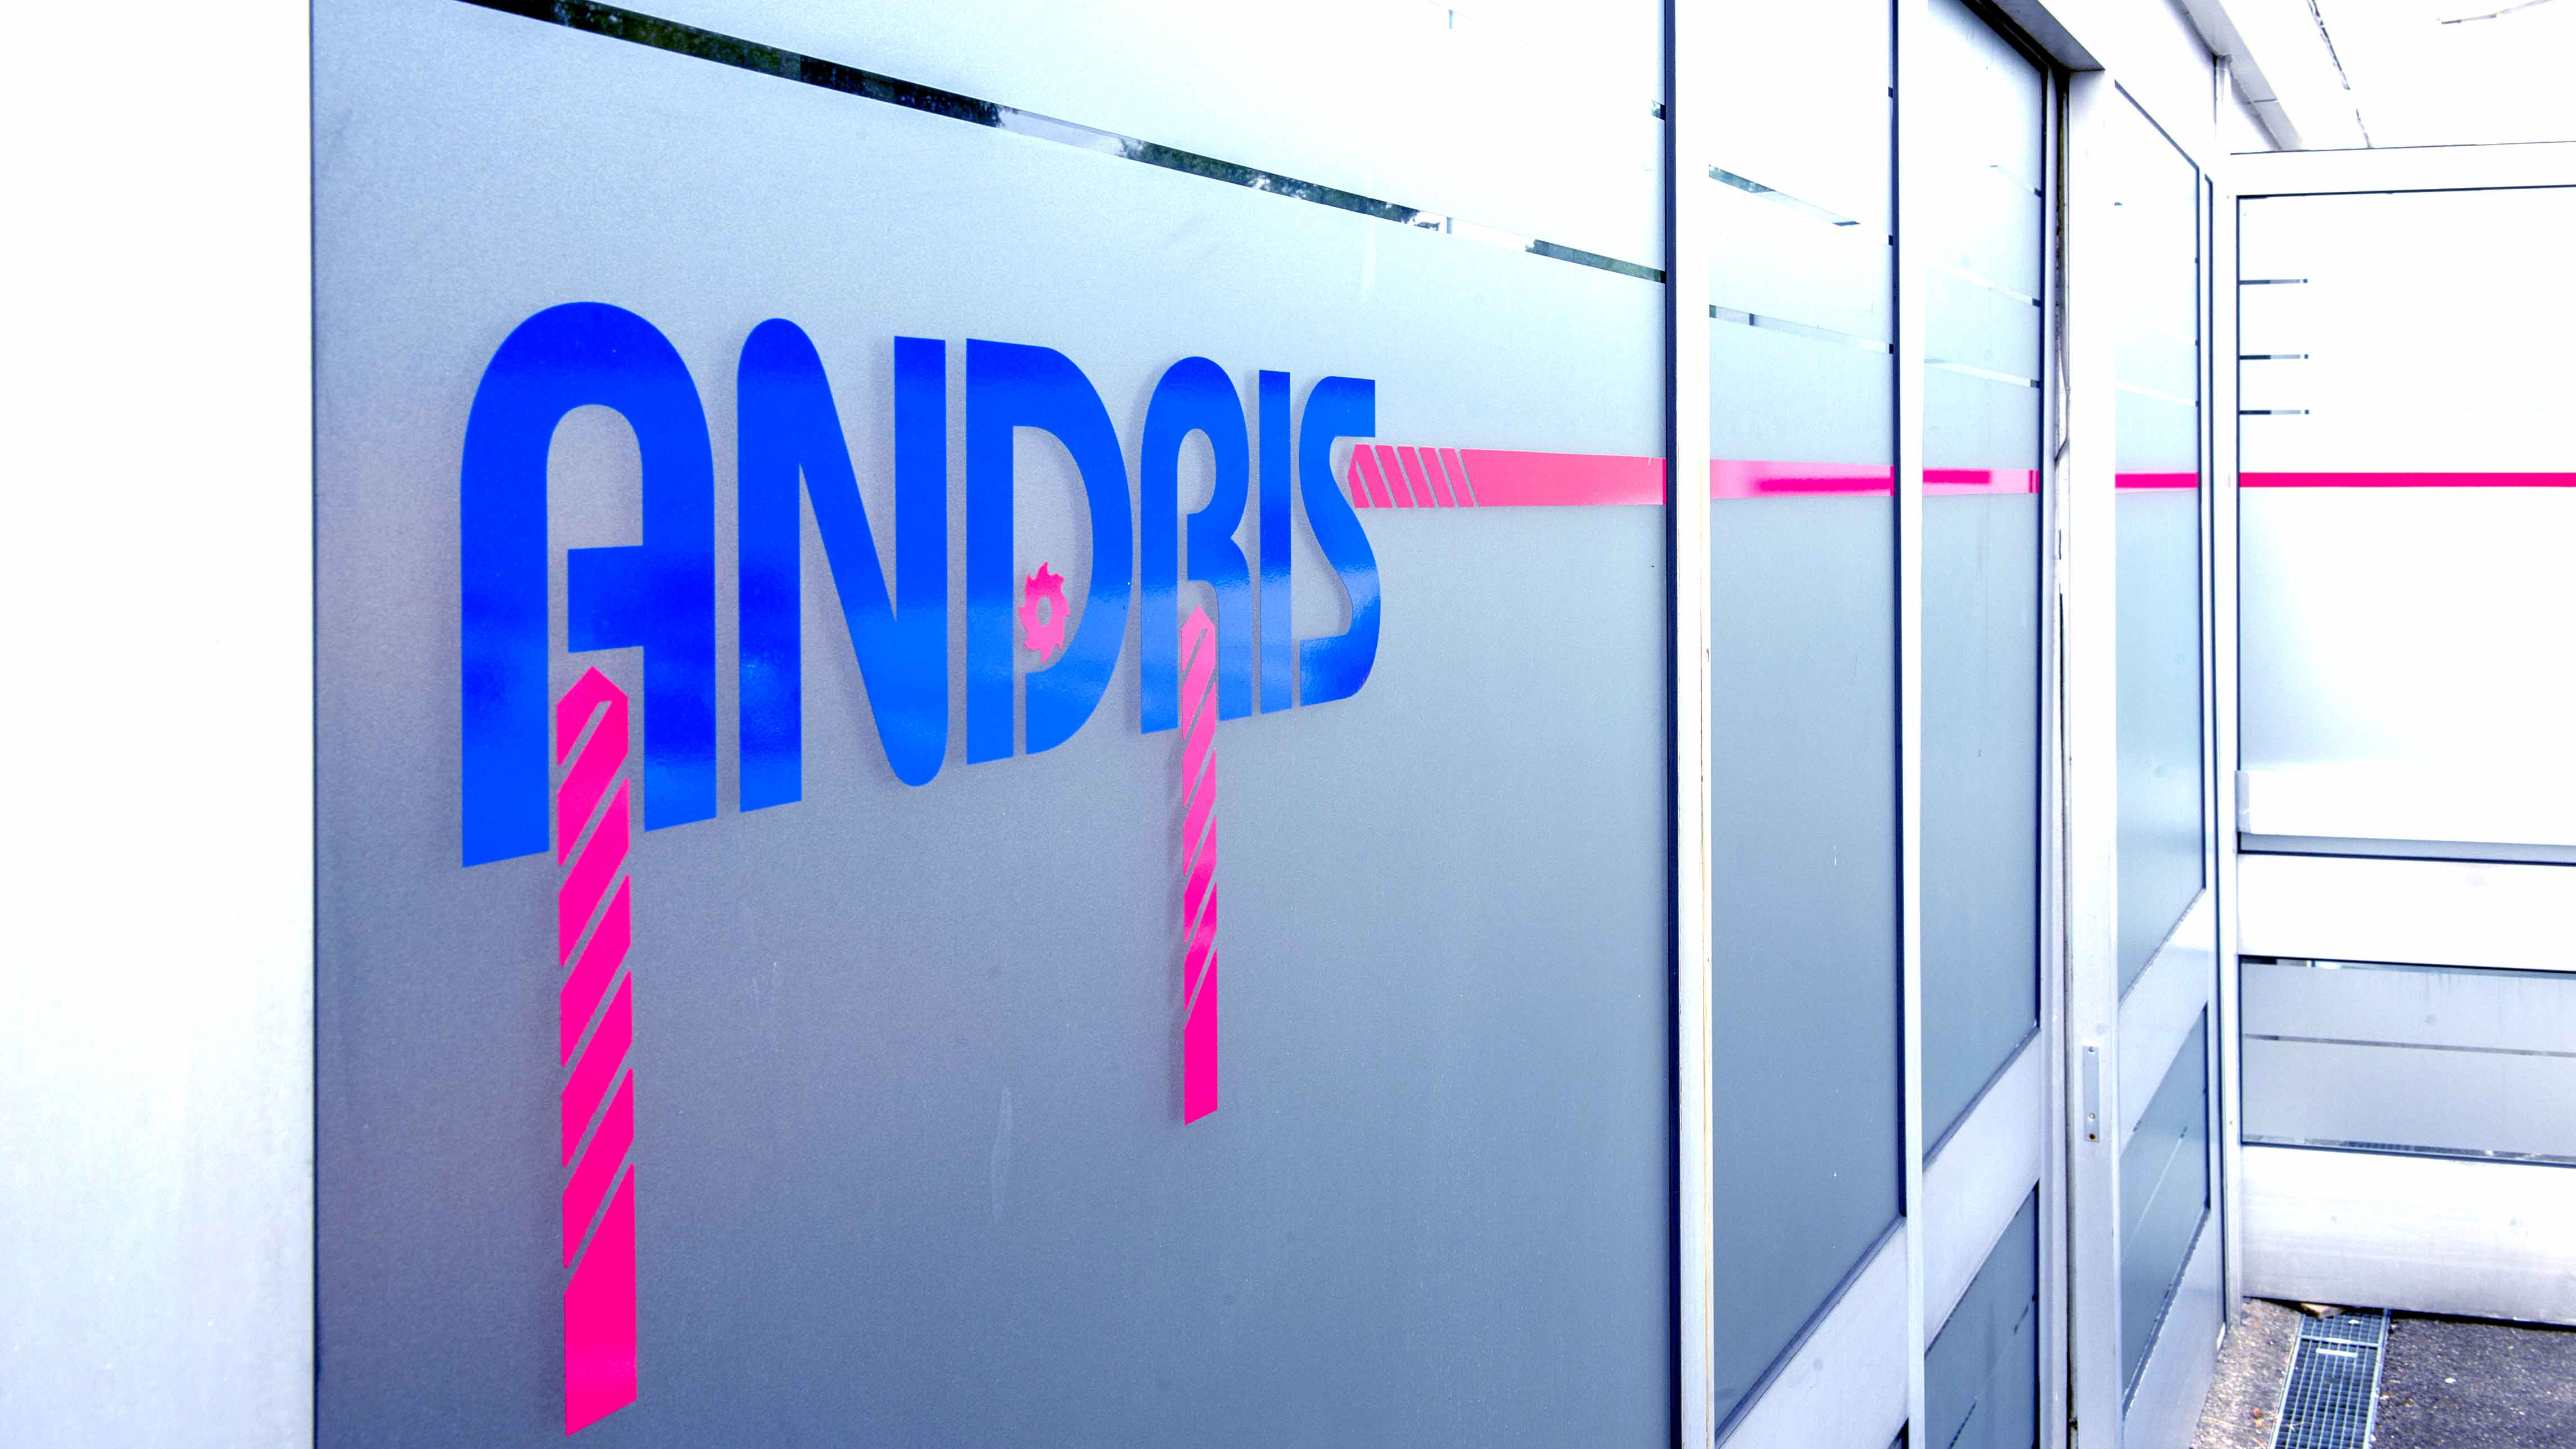 Rolf Andris GmbH